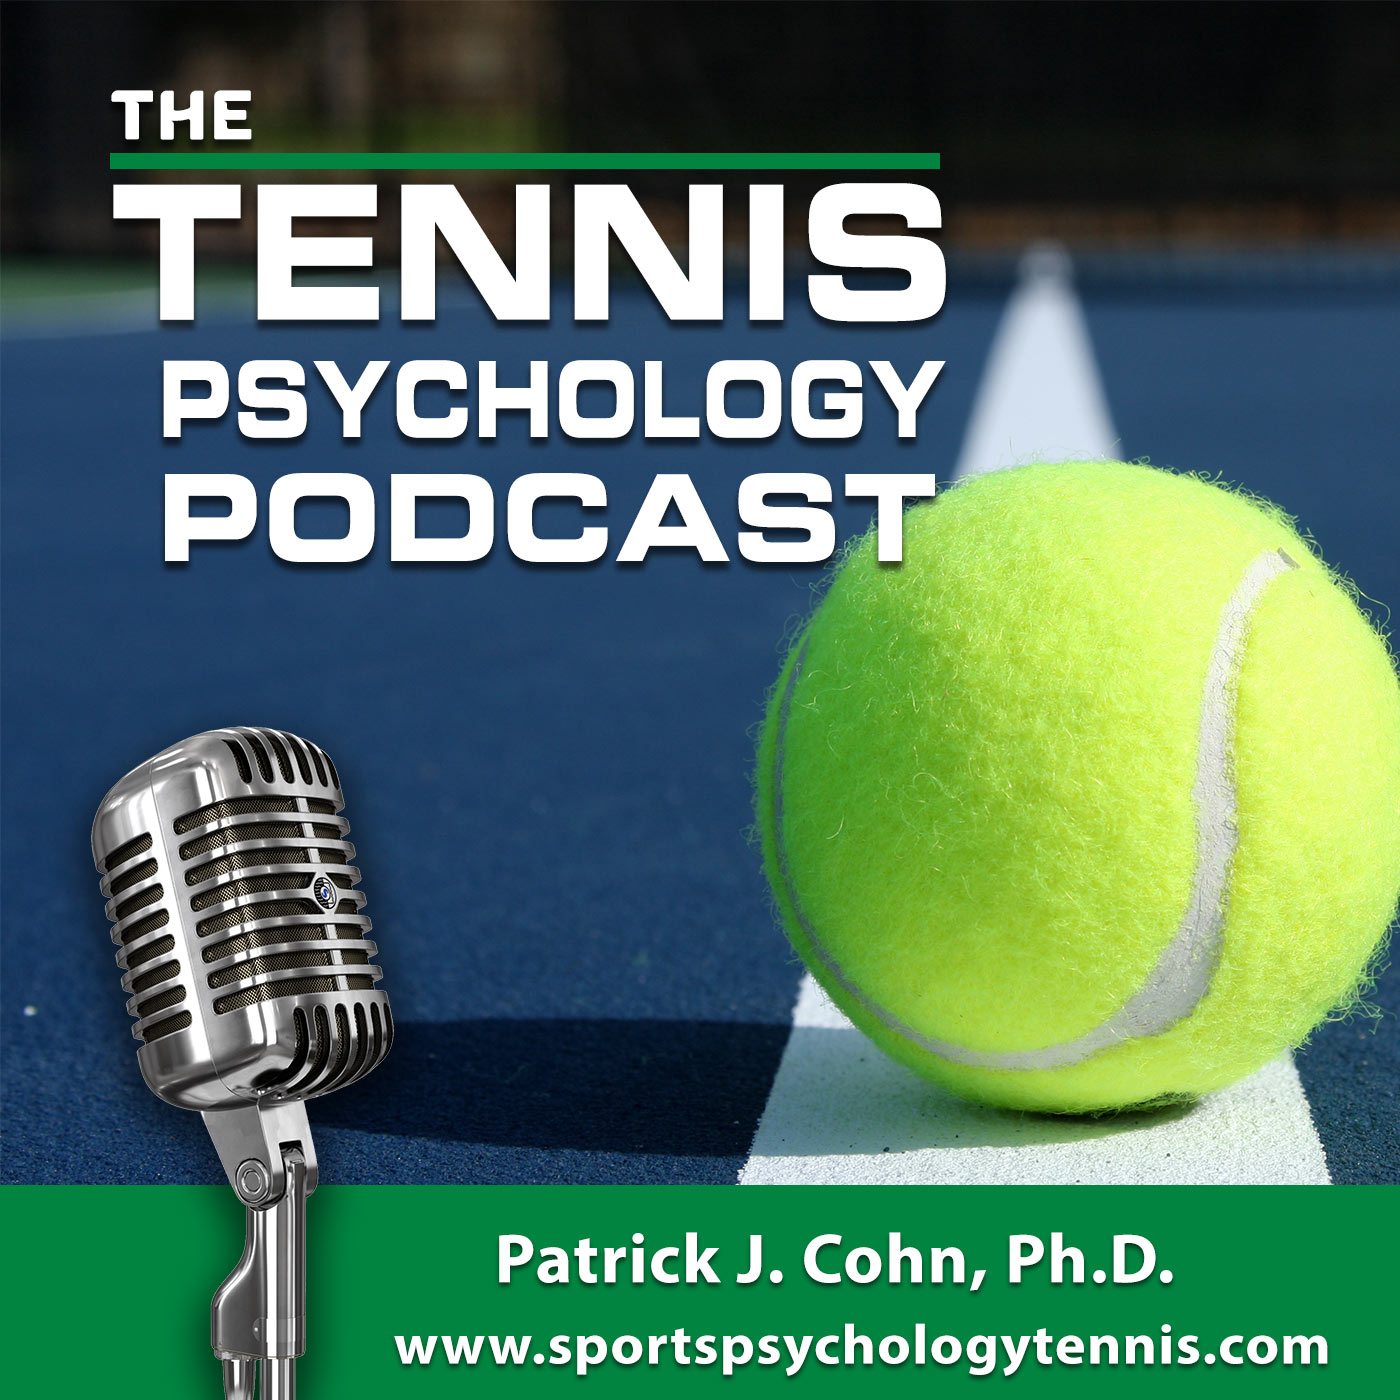 Tennis Psychology Podcast show art